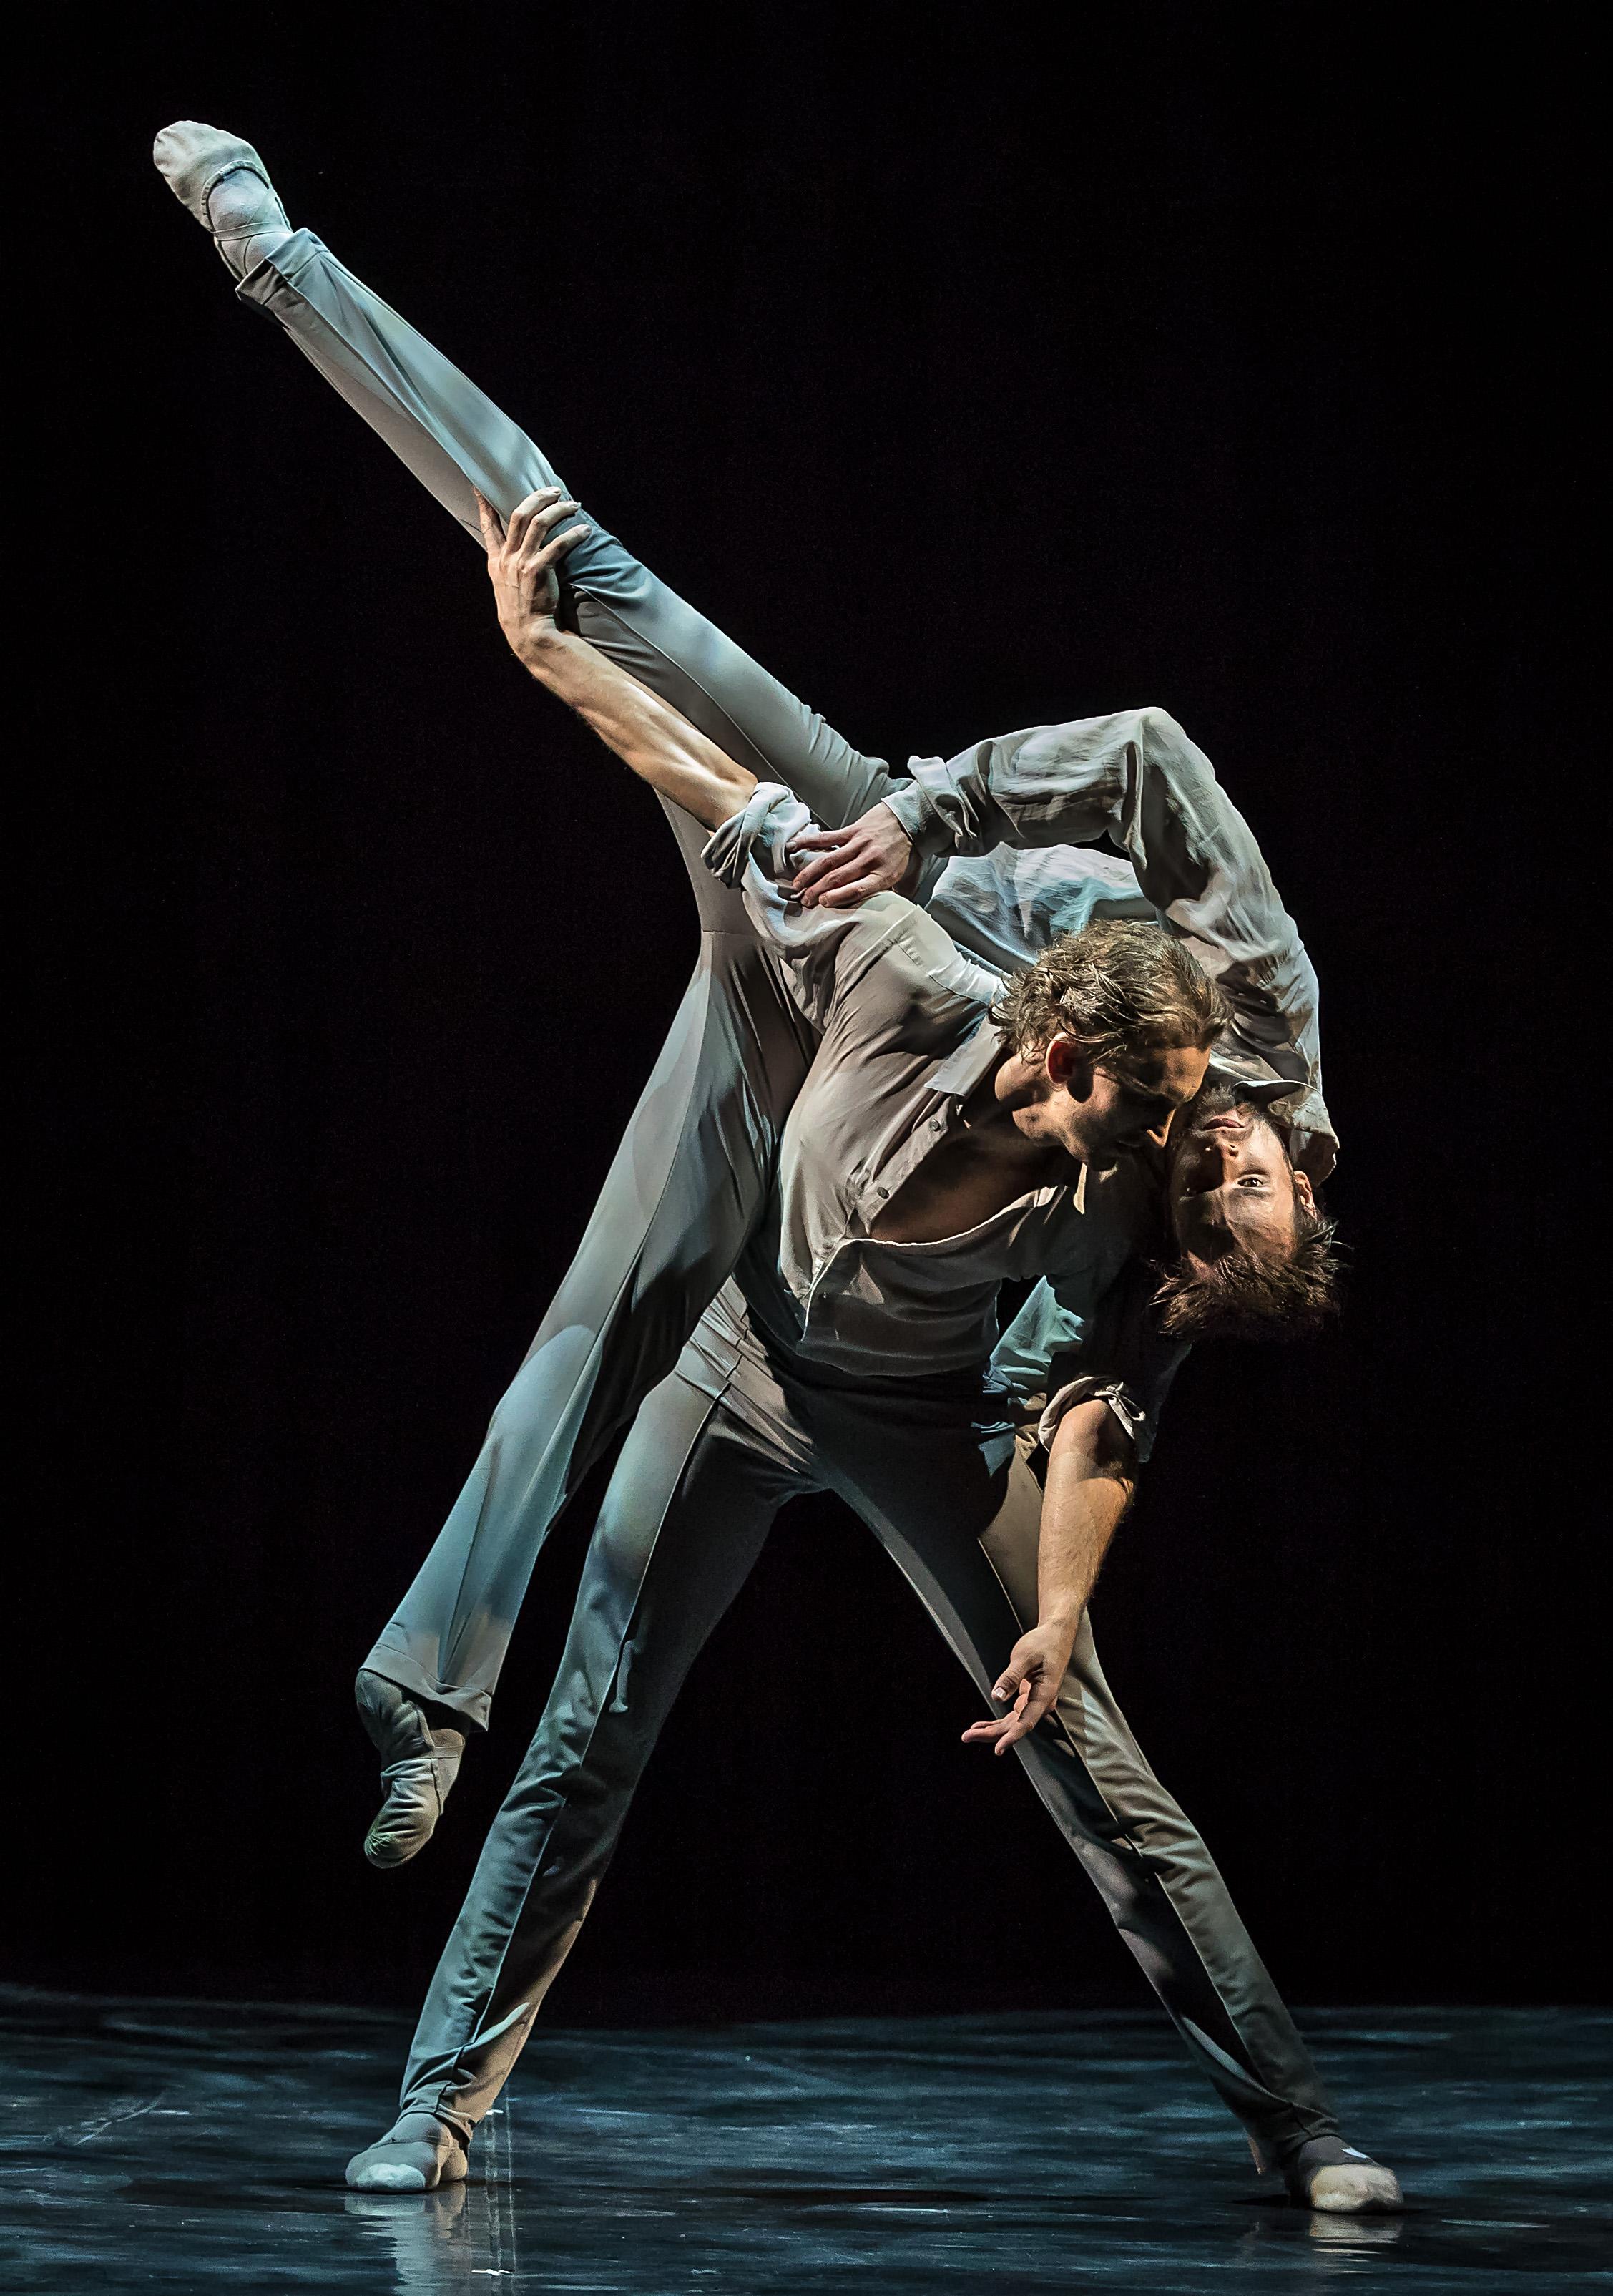 Eifman Ballet - TchaikovskyPROETCONTRA- 3 -Courtesy of Eifman Ballet.jpg